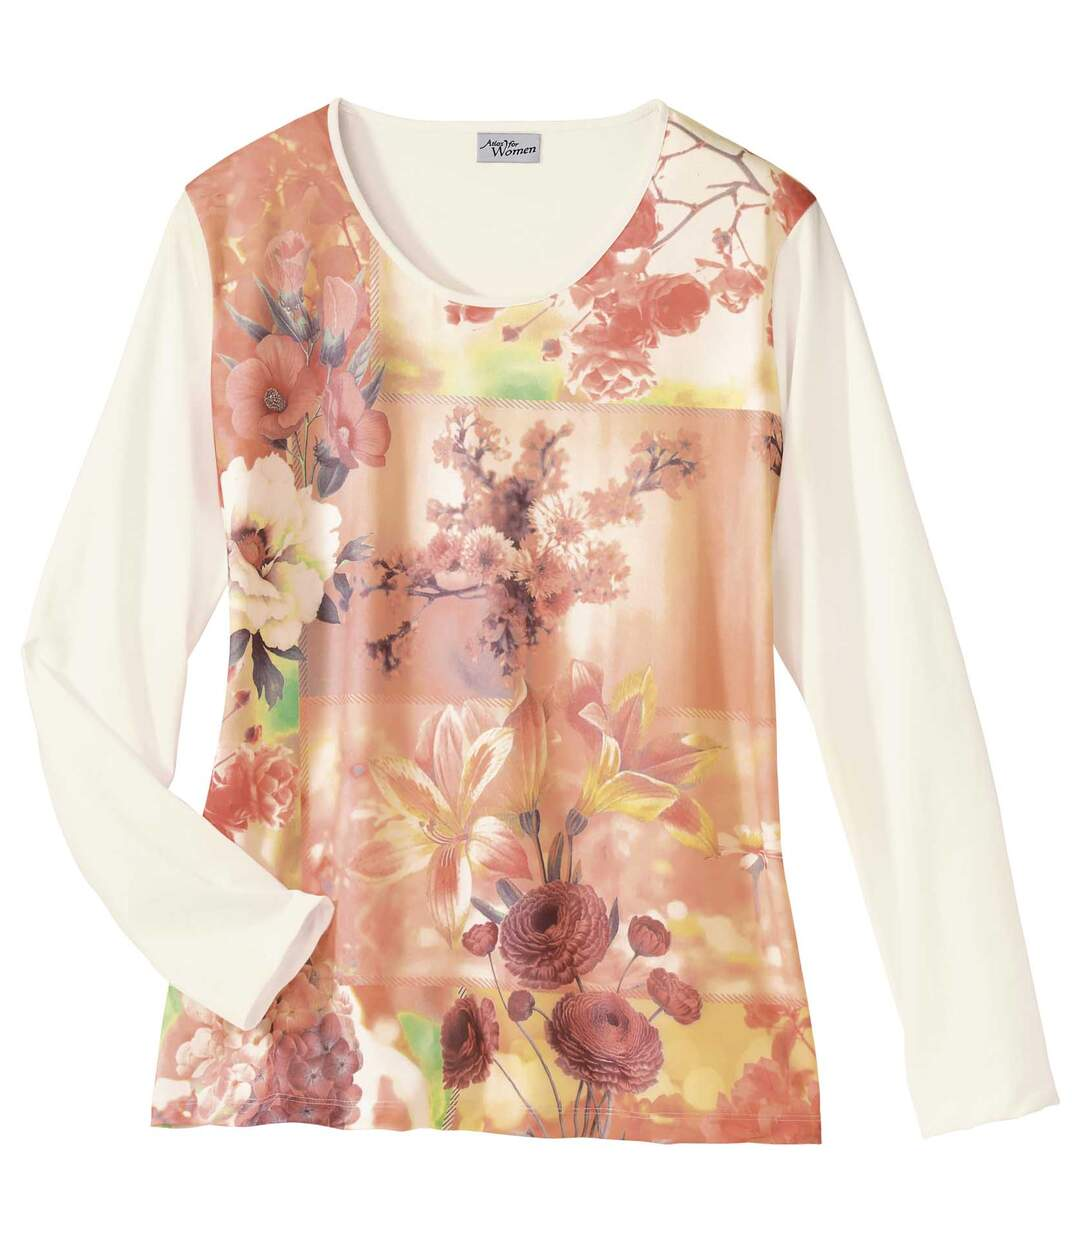 Women's Long Sleeve Top - Floral Motif